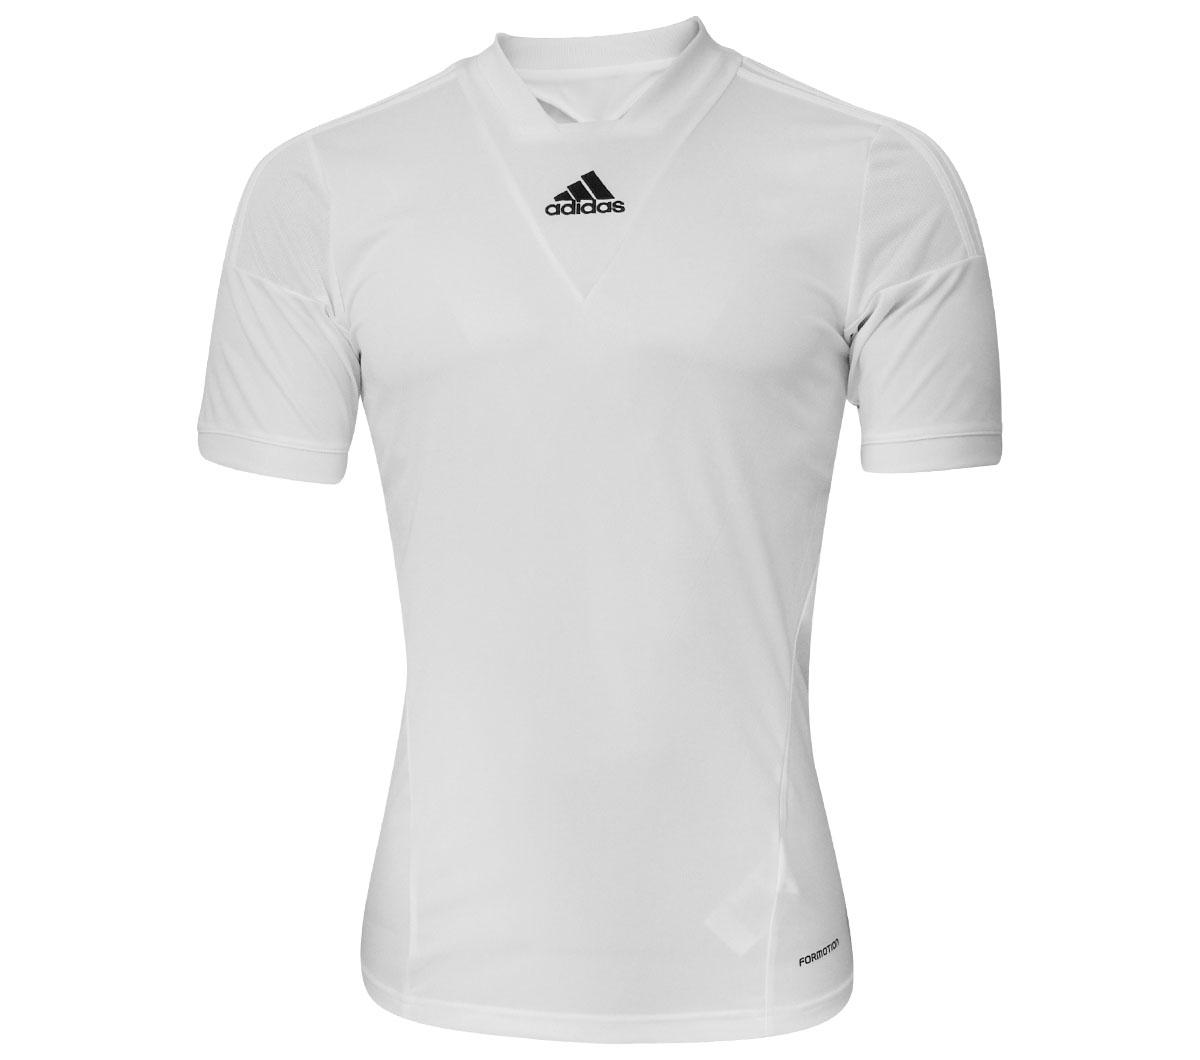 Camisa Adidas Campeon 13 Branca